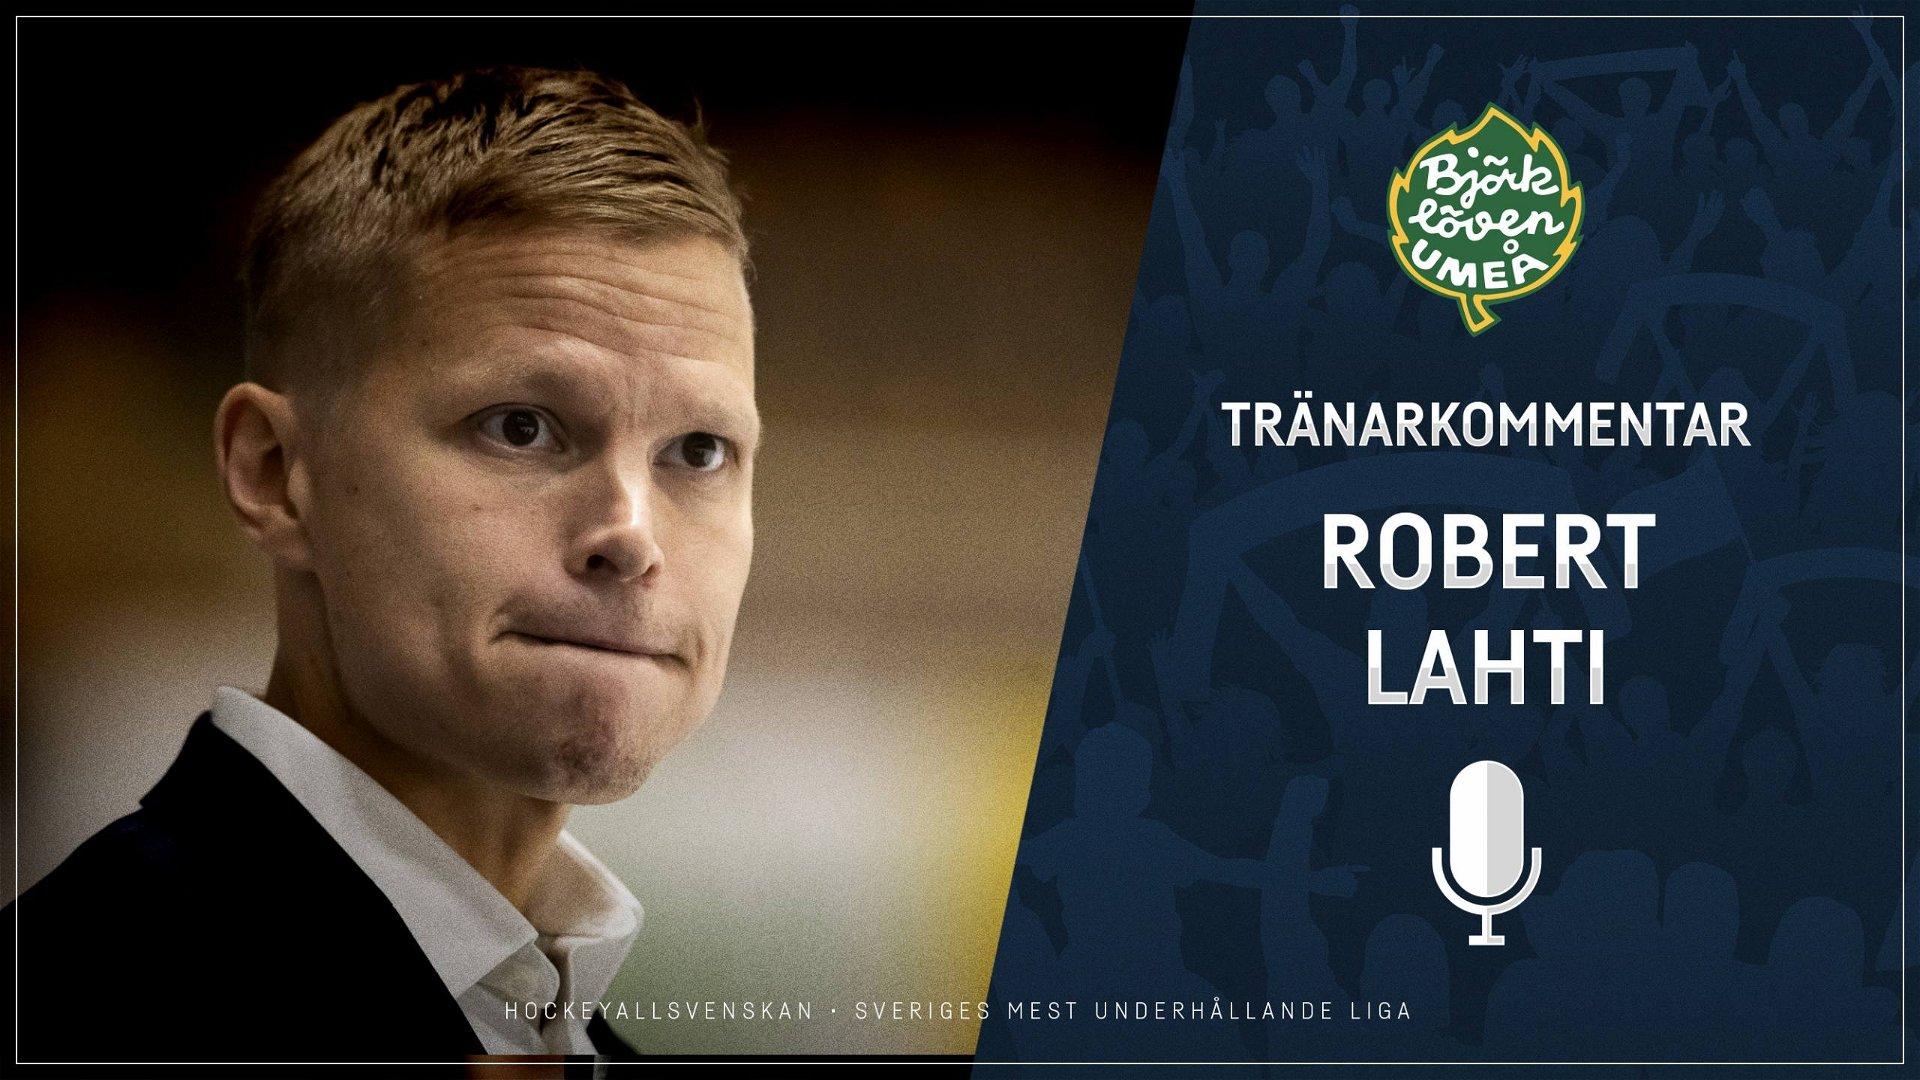 2020-10-18 Segerintervju: Robert Lahti, Björklöven